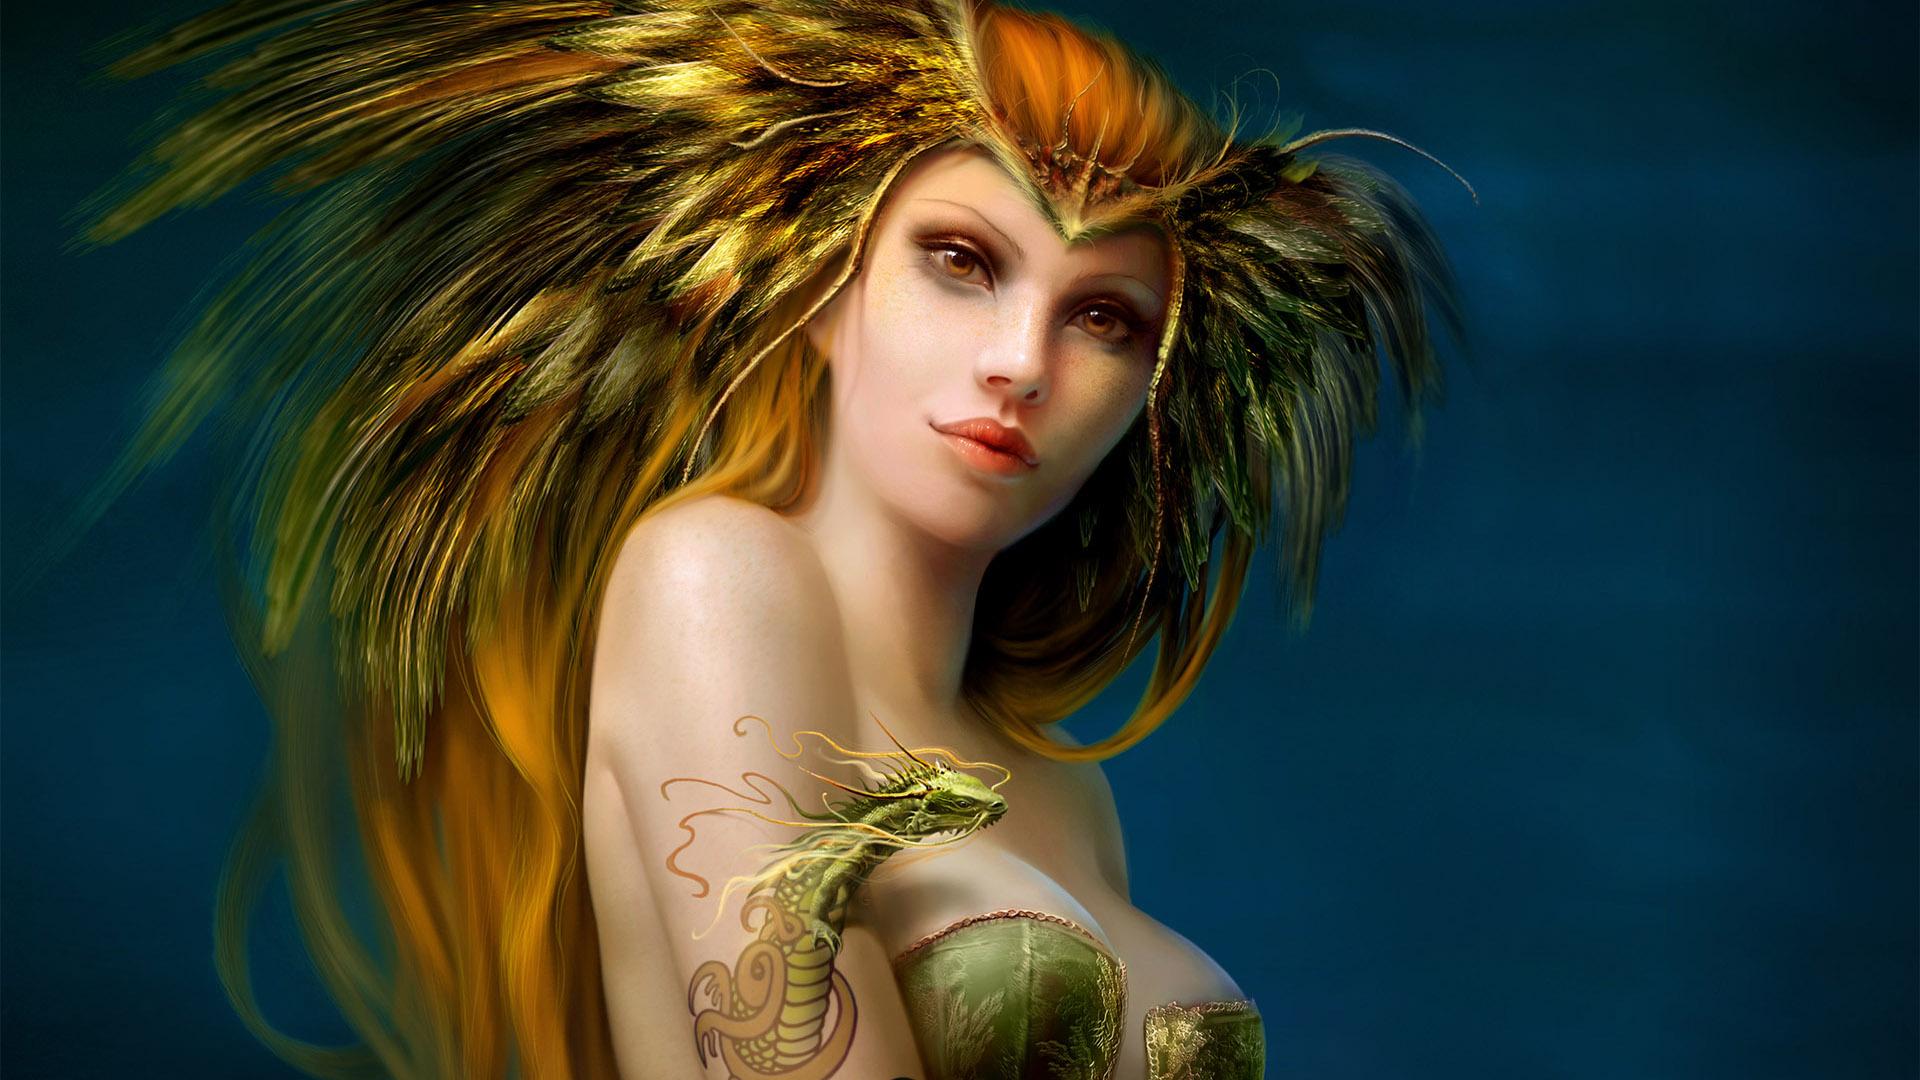 3D  Fantasy Girls Hd Wallpaper 03  Imagez Only-7677